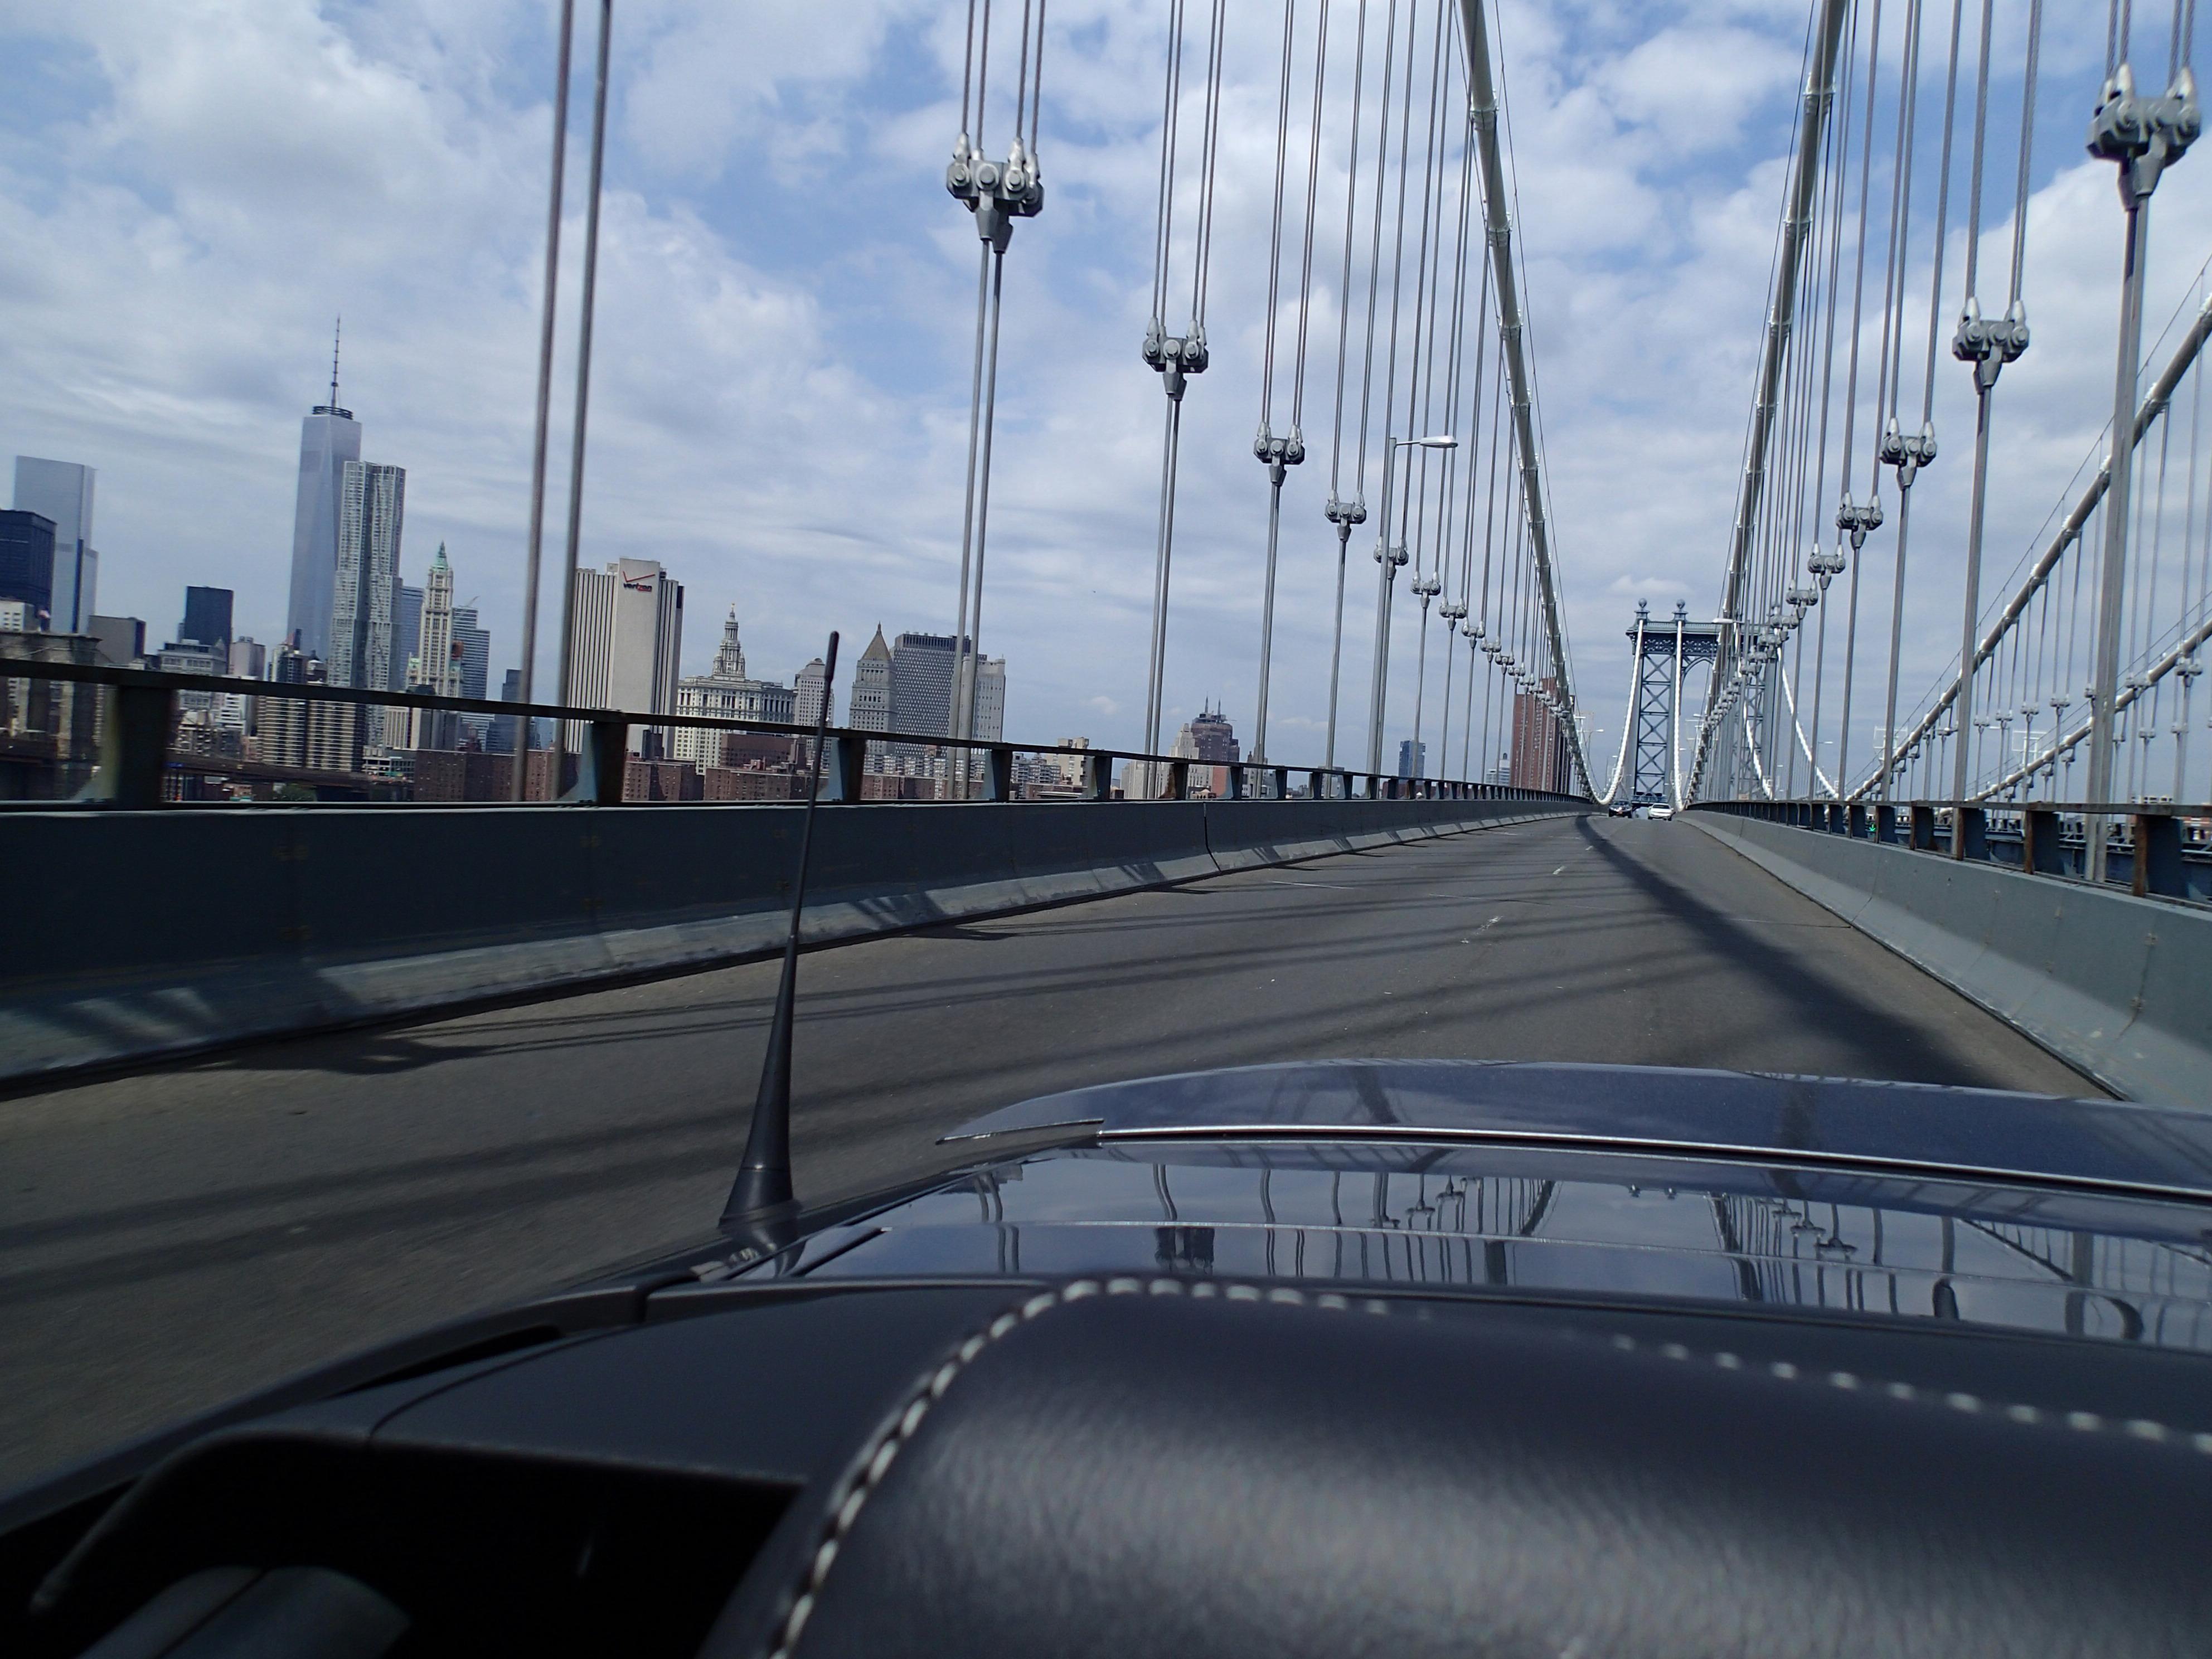 bridgedrive